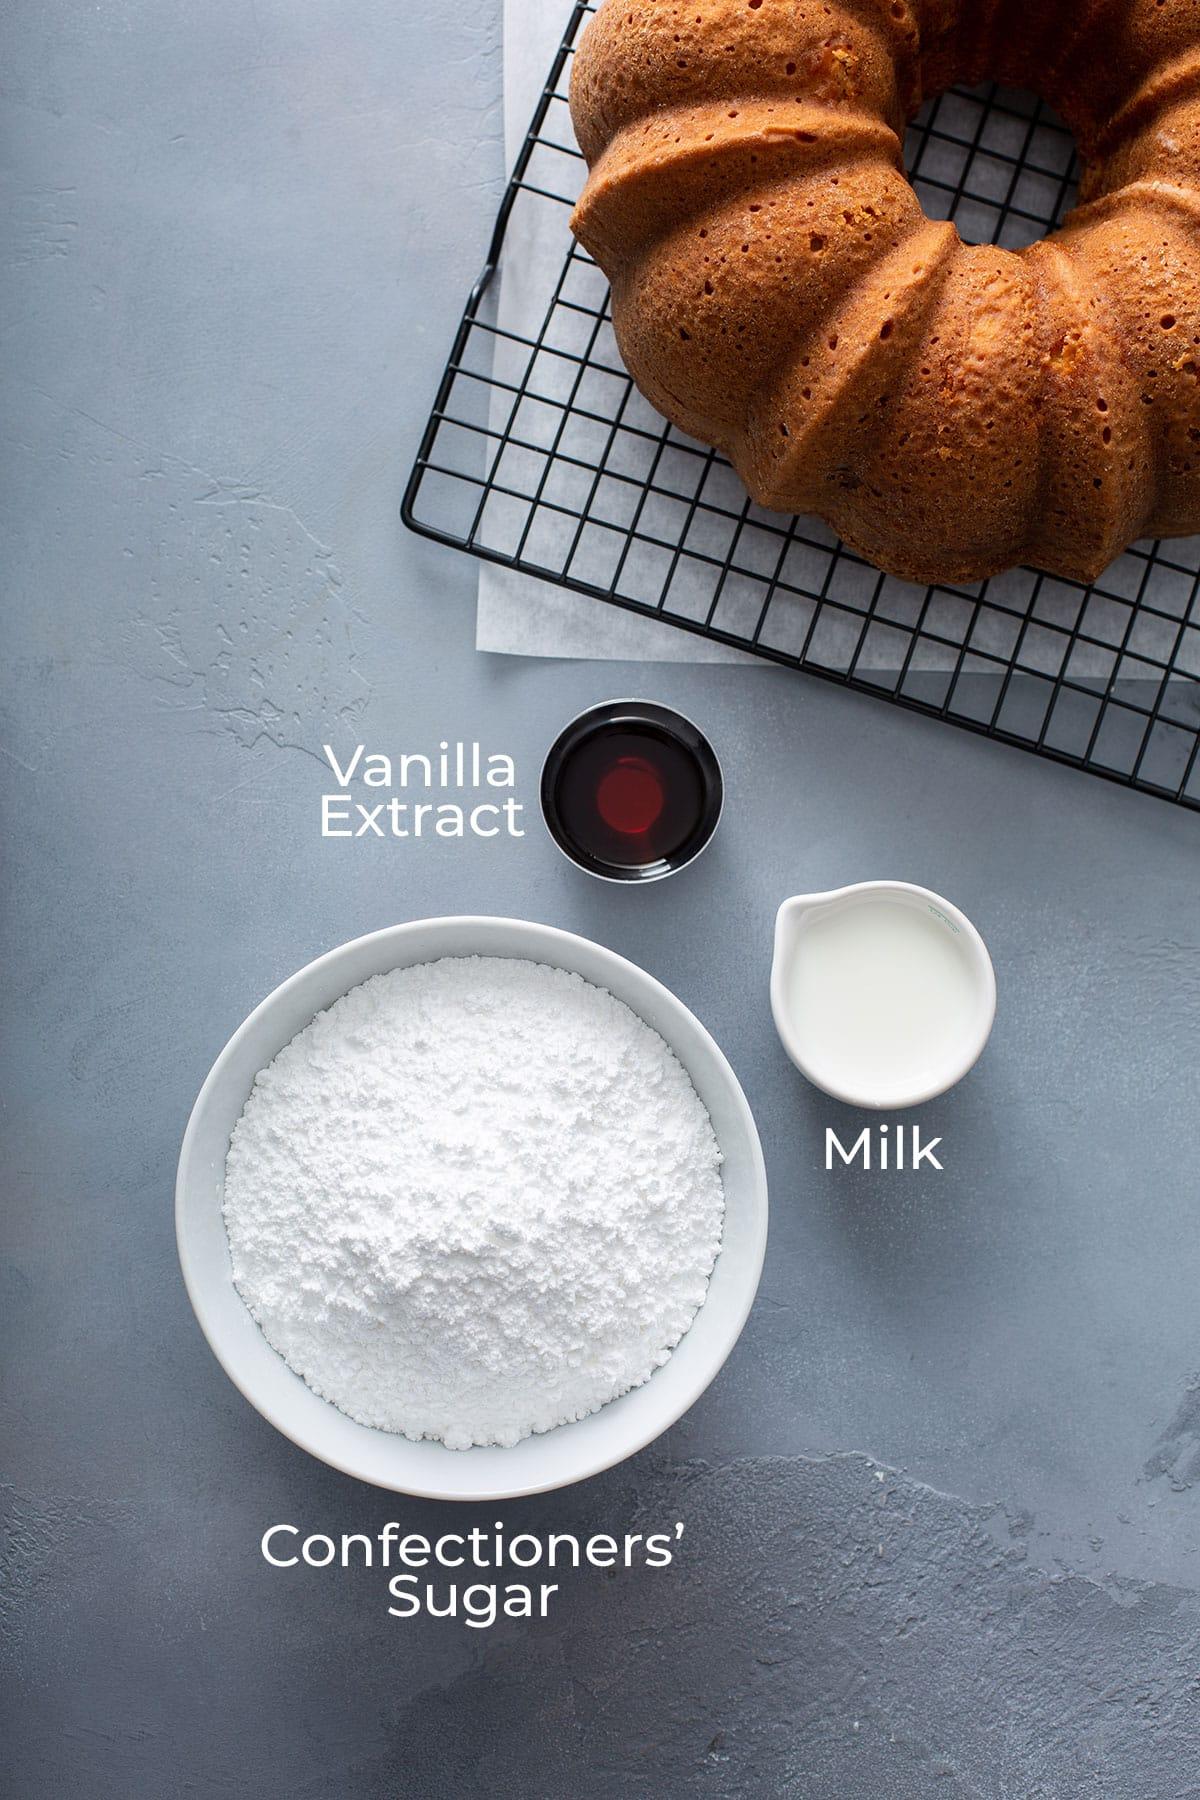 Ingredients to make Vanilla Glaze